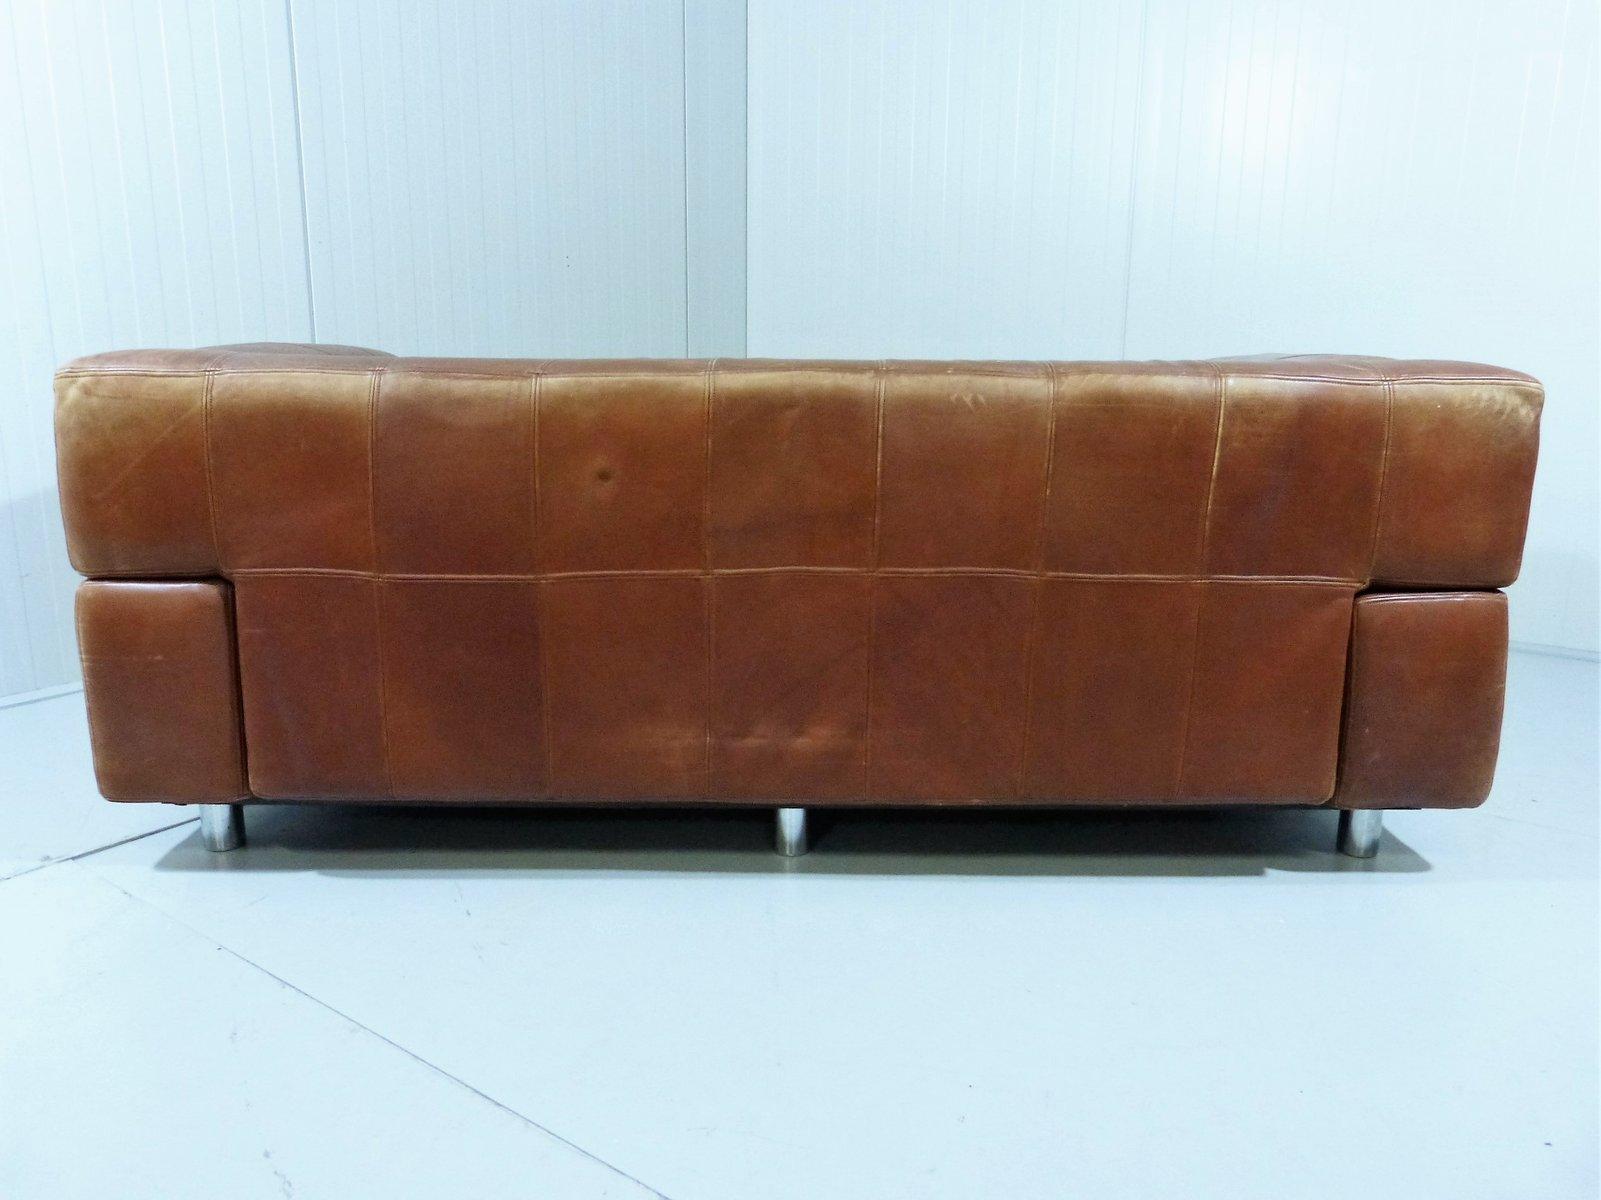 patchwork sofas for sale 28 images rare lisa whatmough. Black Bedroom Furniture Sets. Home Design Ideas